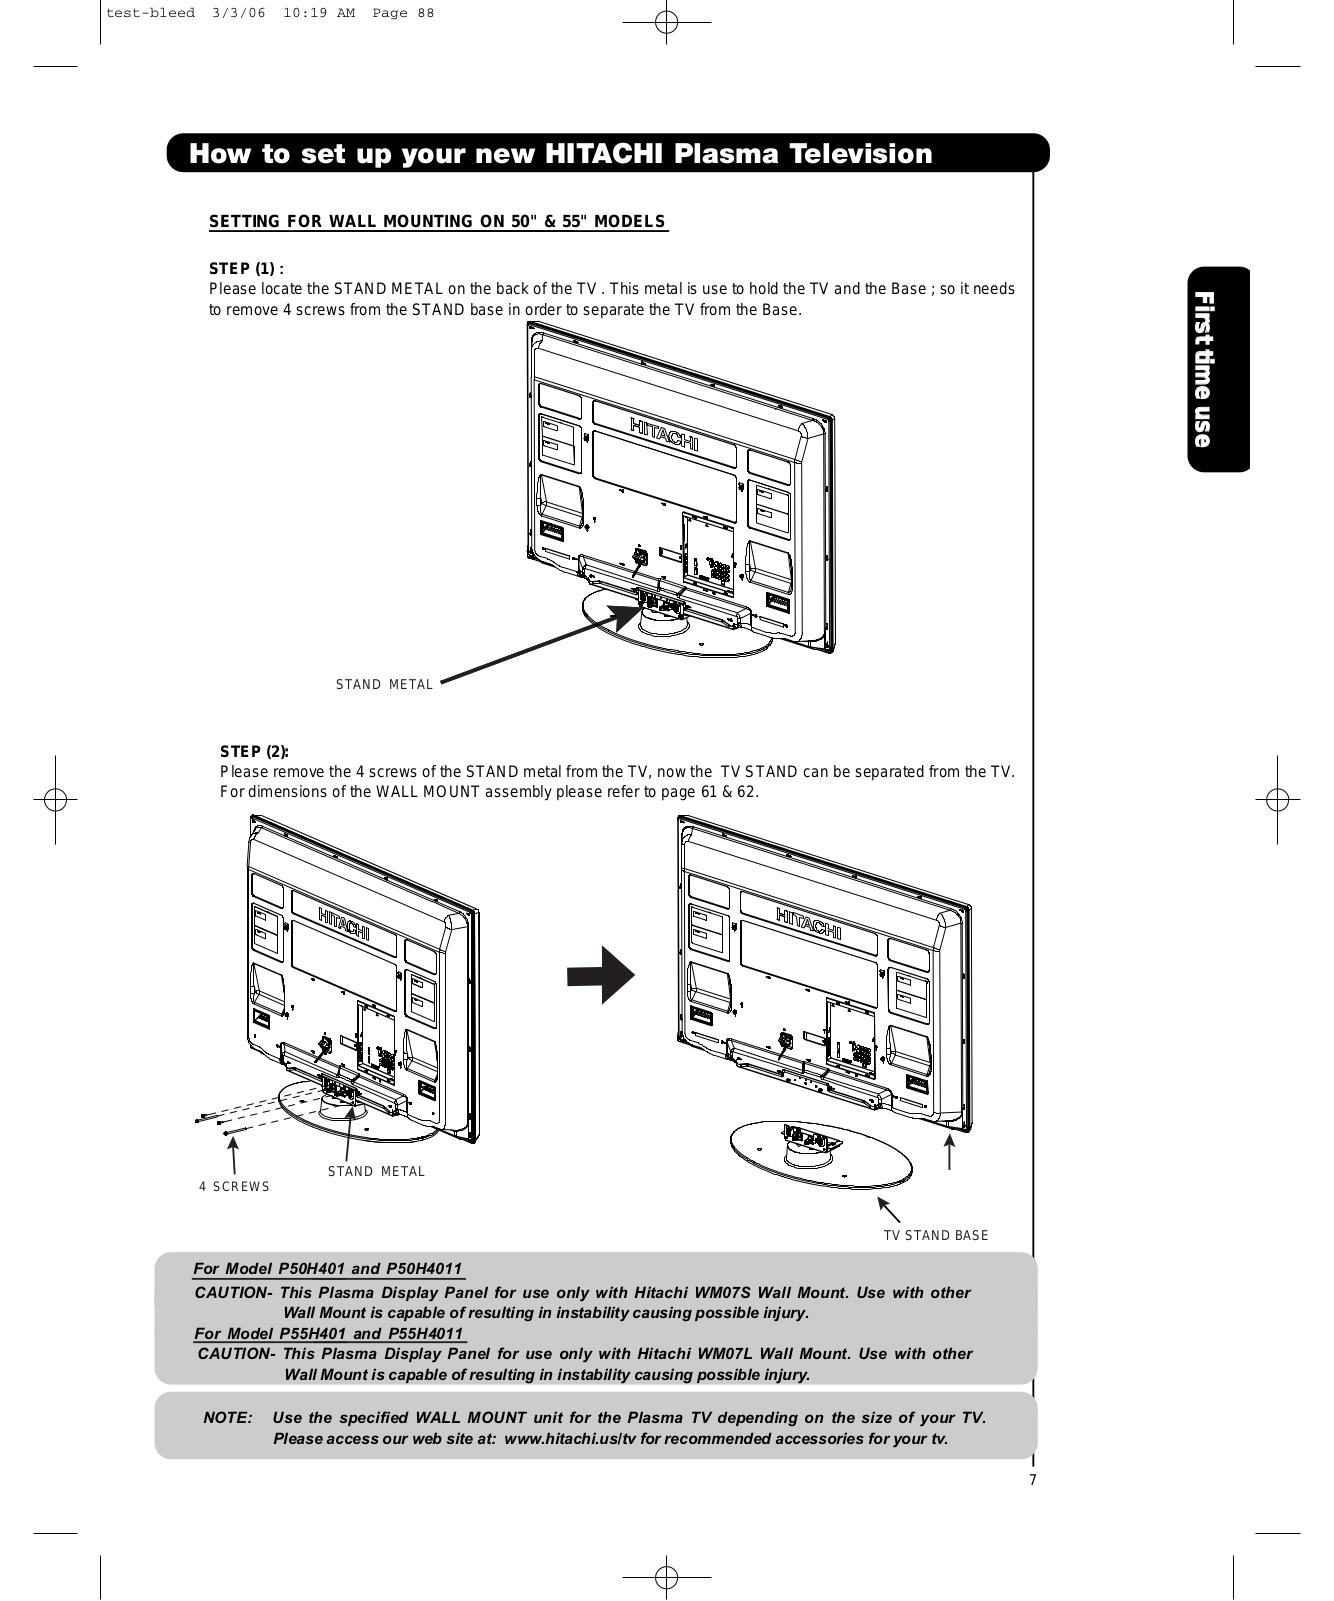 Hitachi P55h4011 P50h4011 P55h401 User Manual